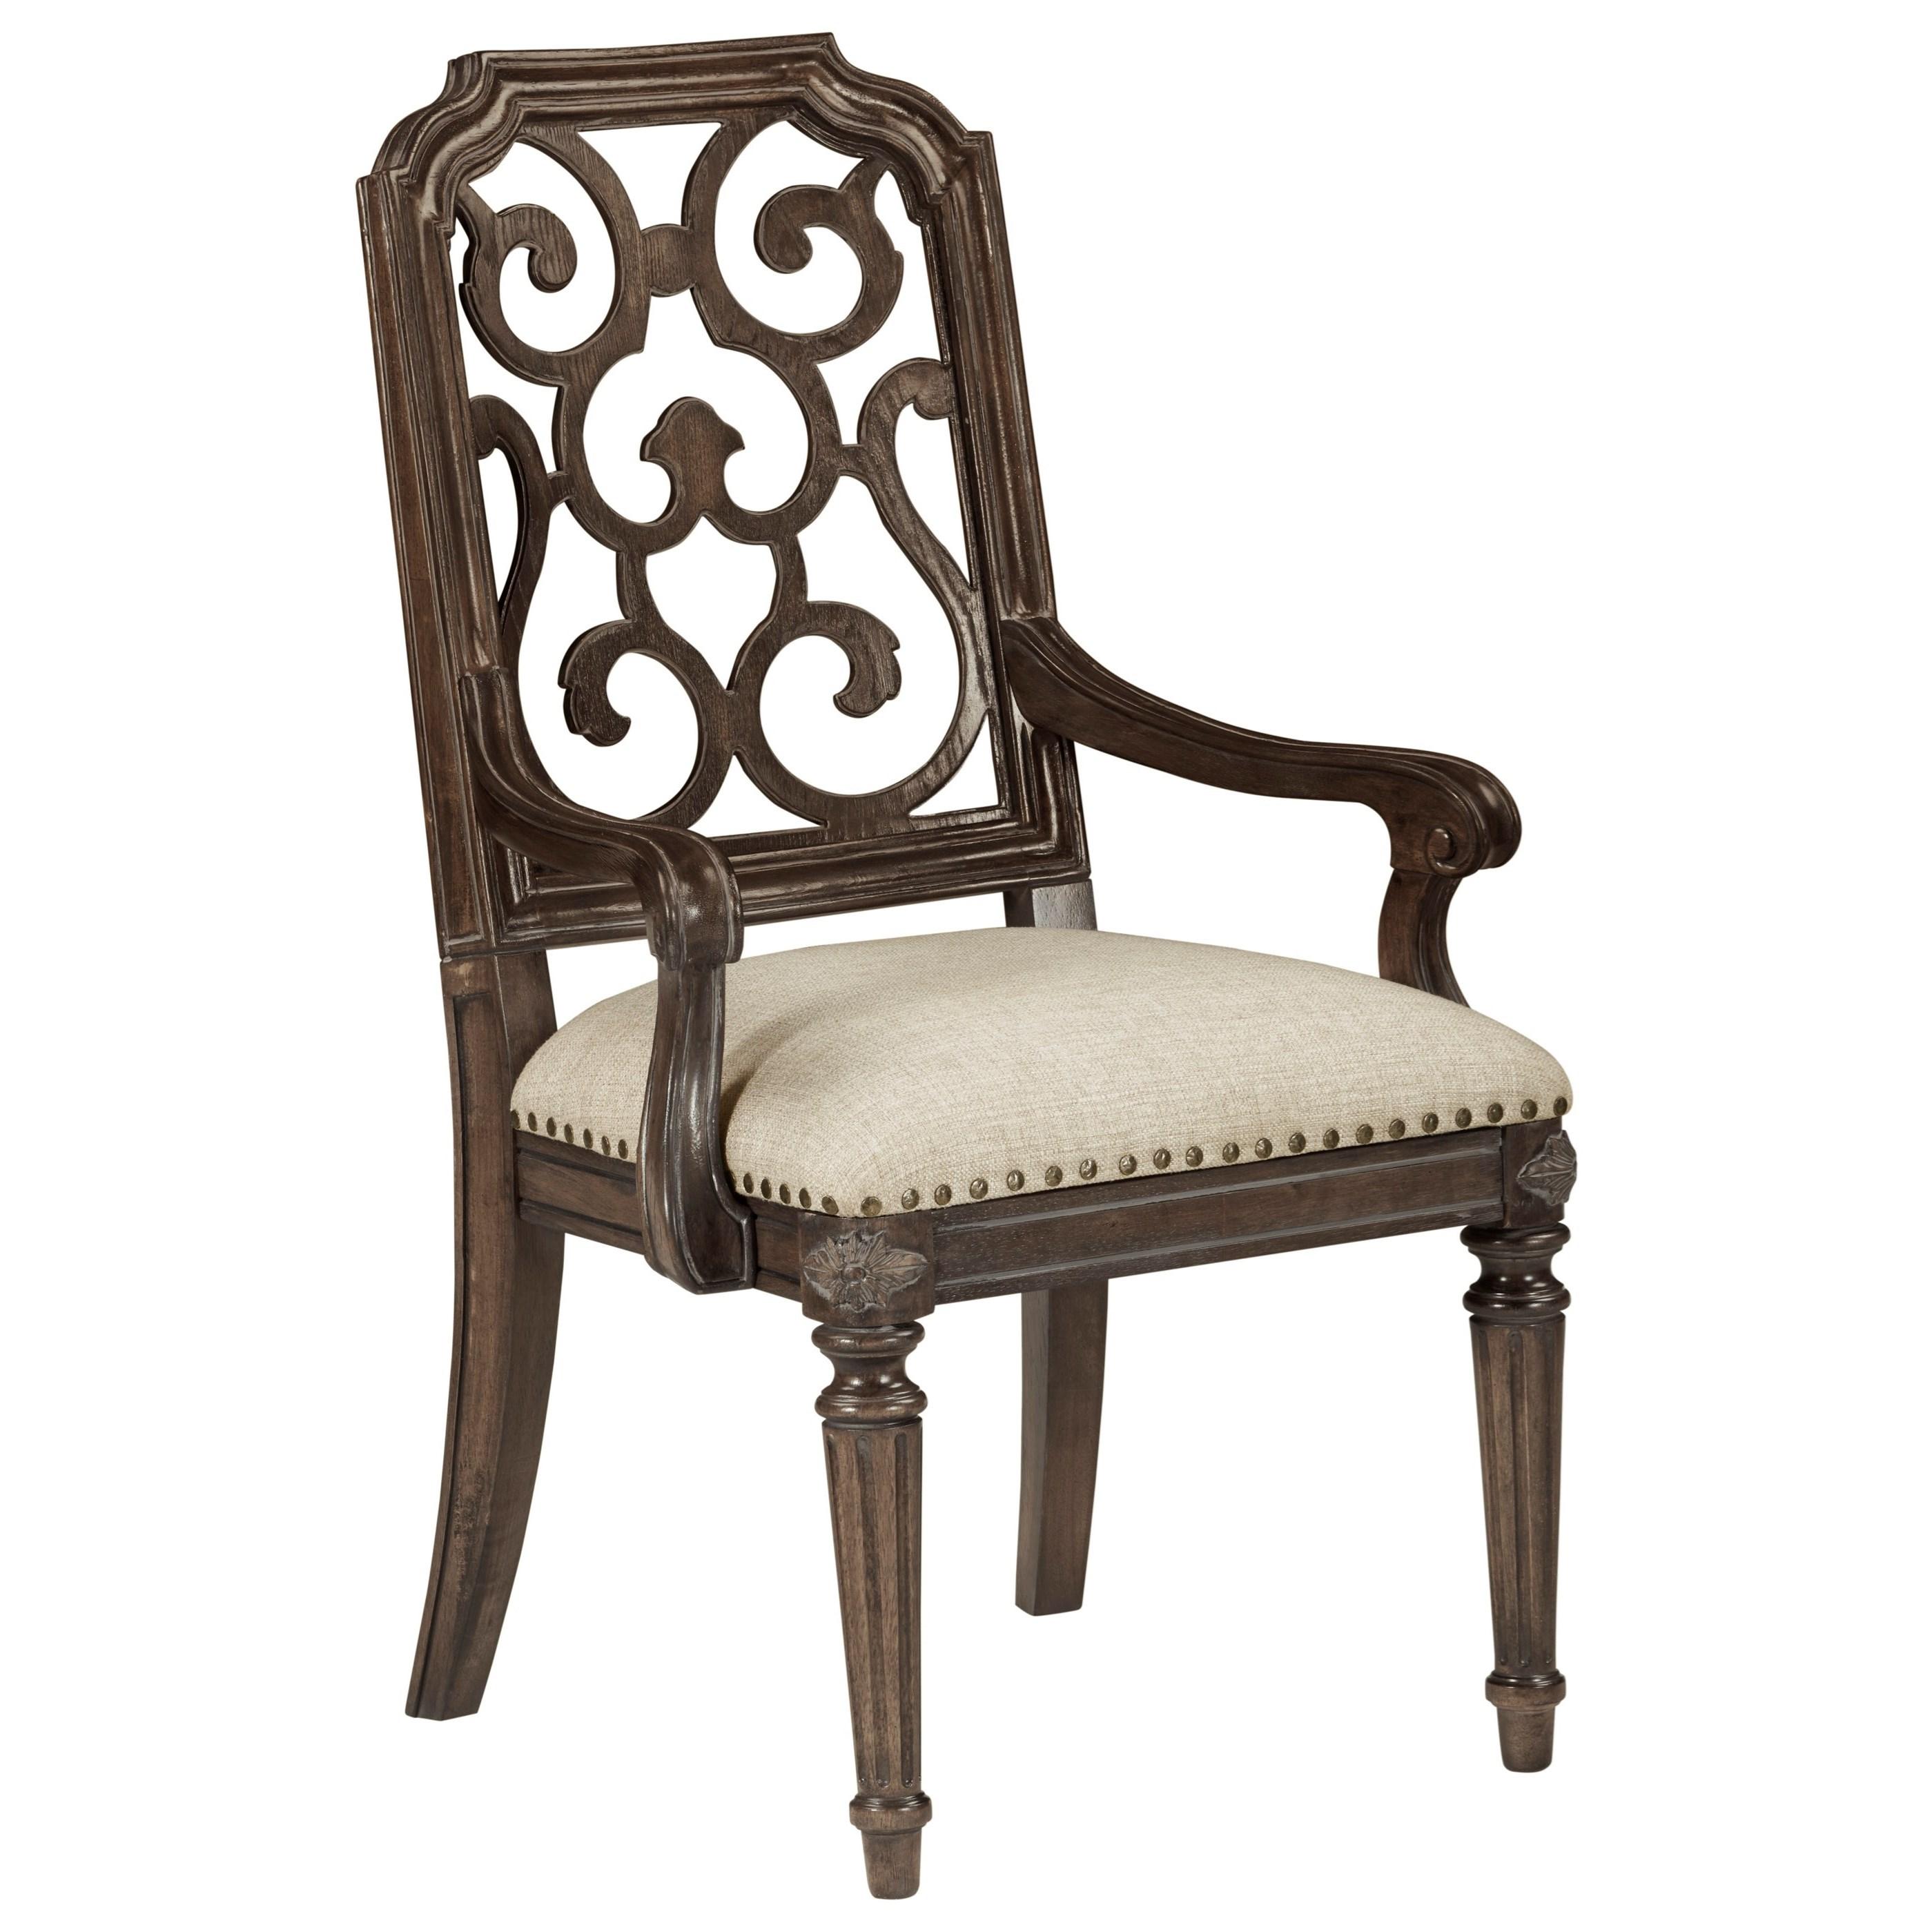 Vintage Salvage  Tristan Fret Back Arm Chair  by Klien Furniture at Sprintz Furniture